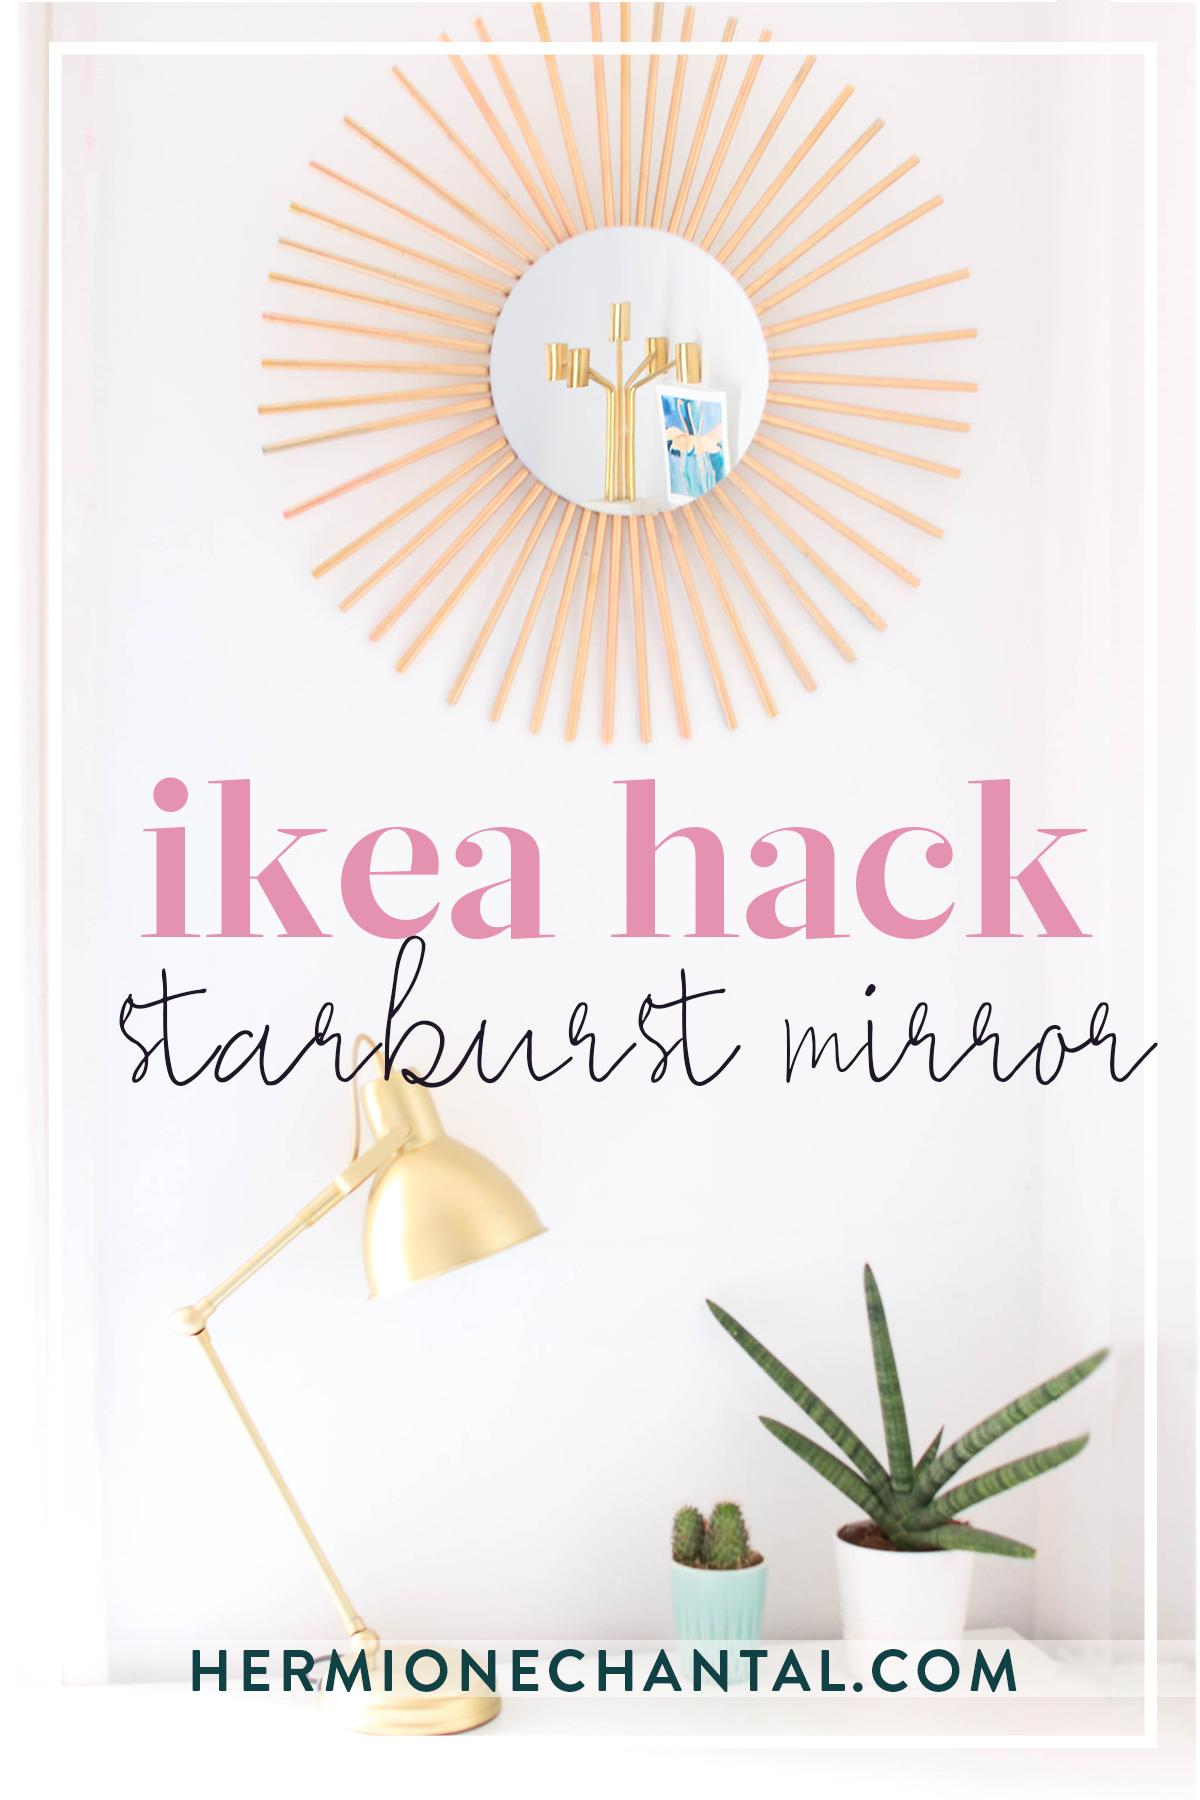 Starburst Mirror Ikea Hack.png